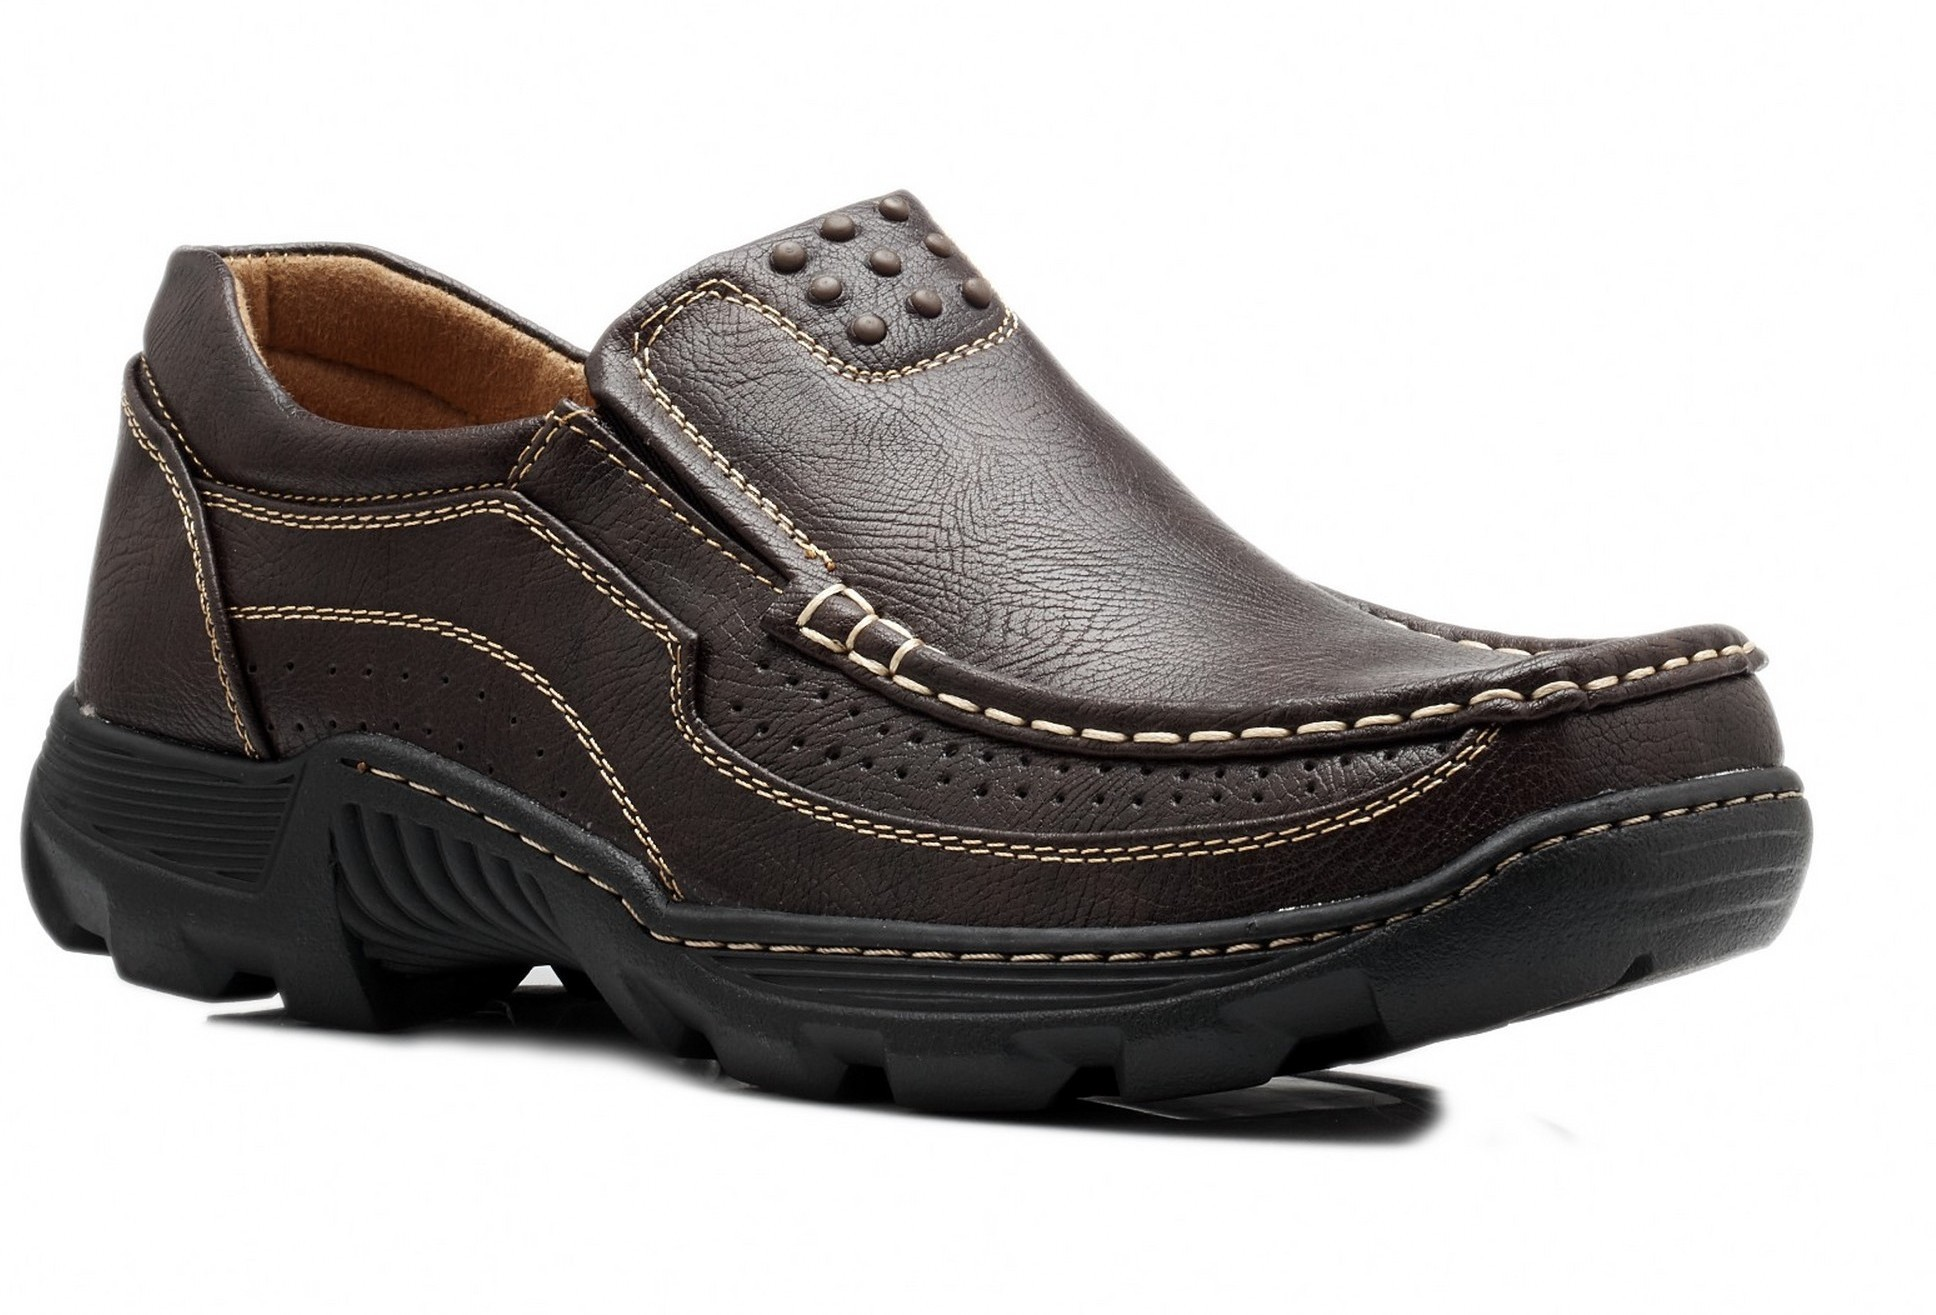 Touristor Paul Casual Shoes